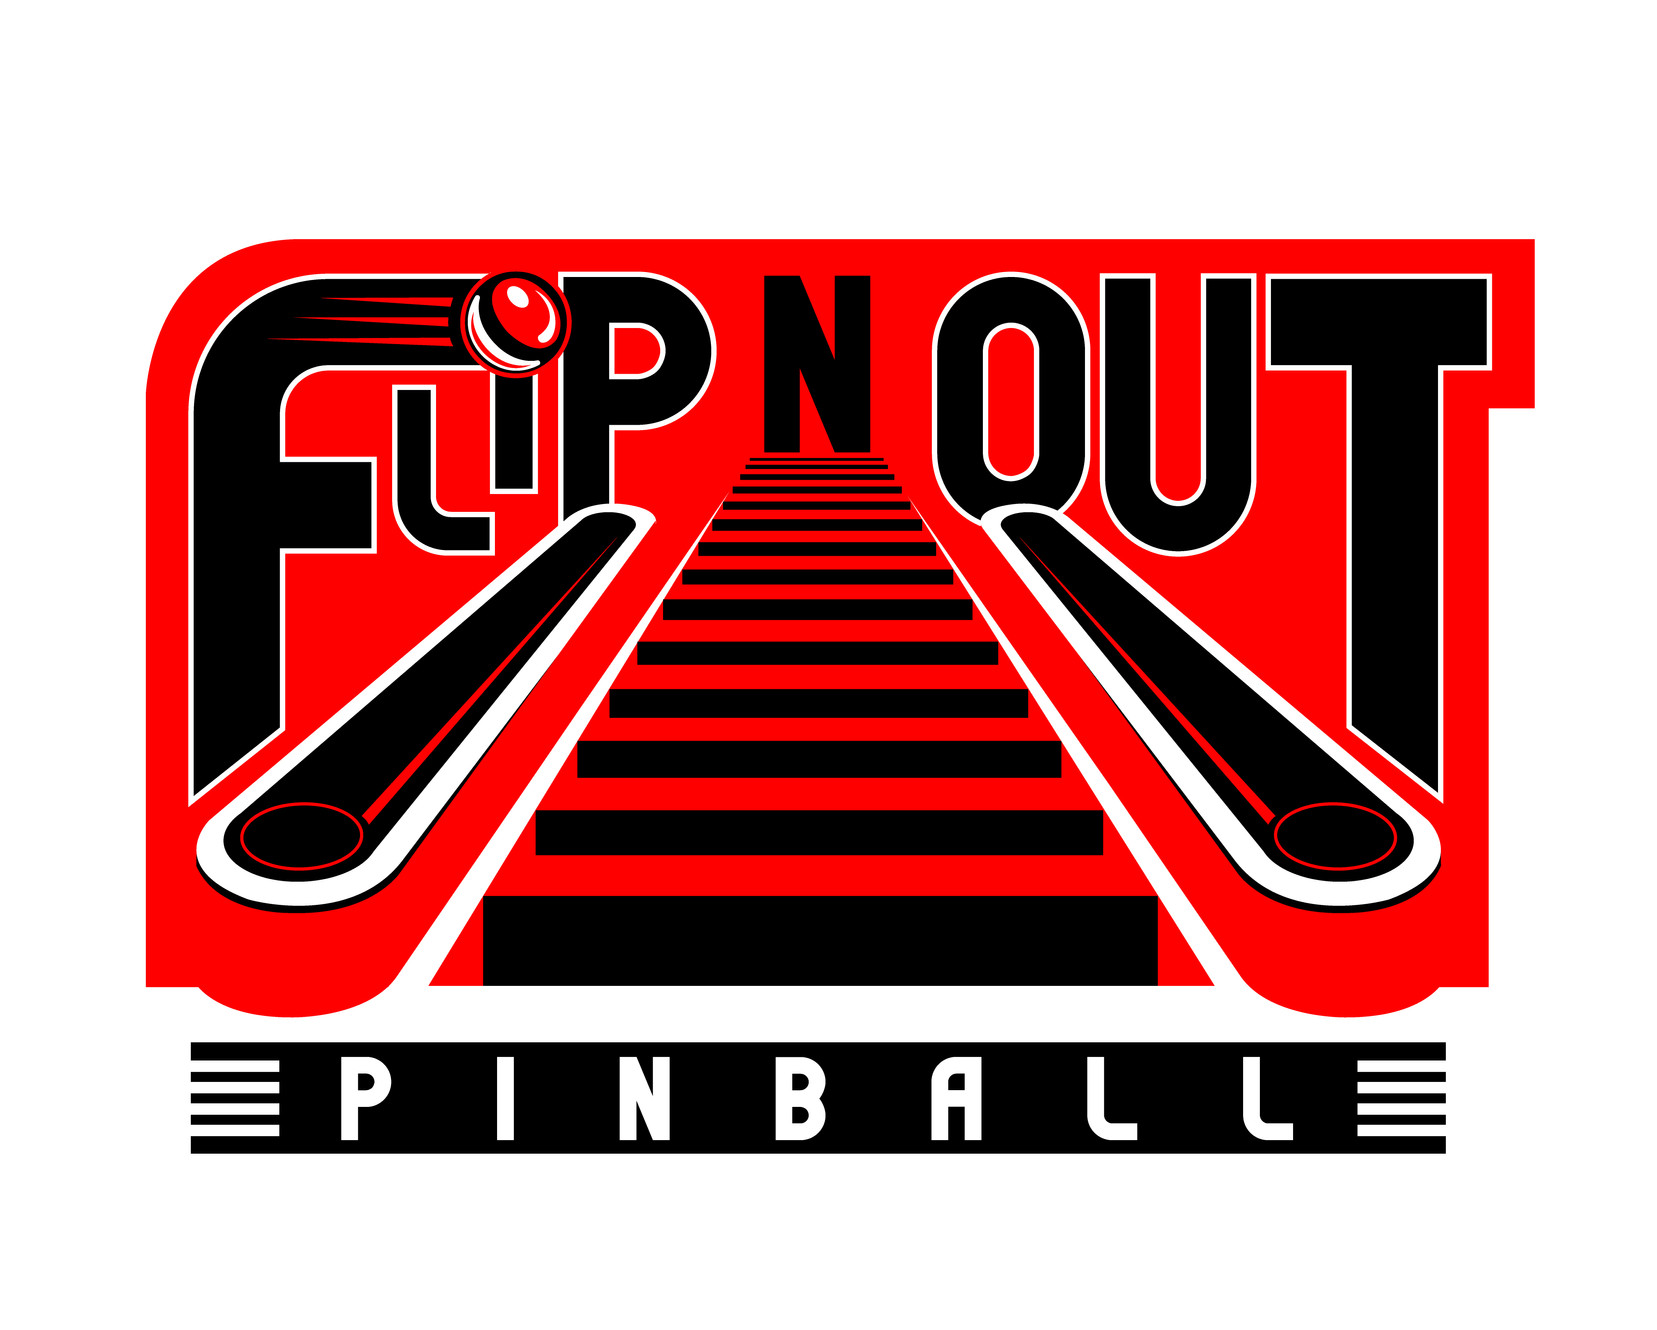 www.flipnoutpinball.com